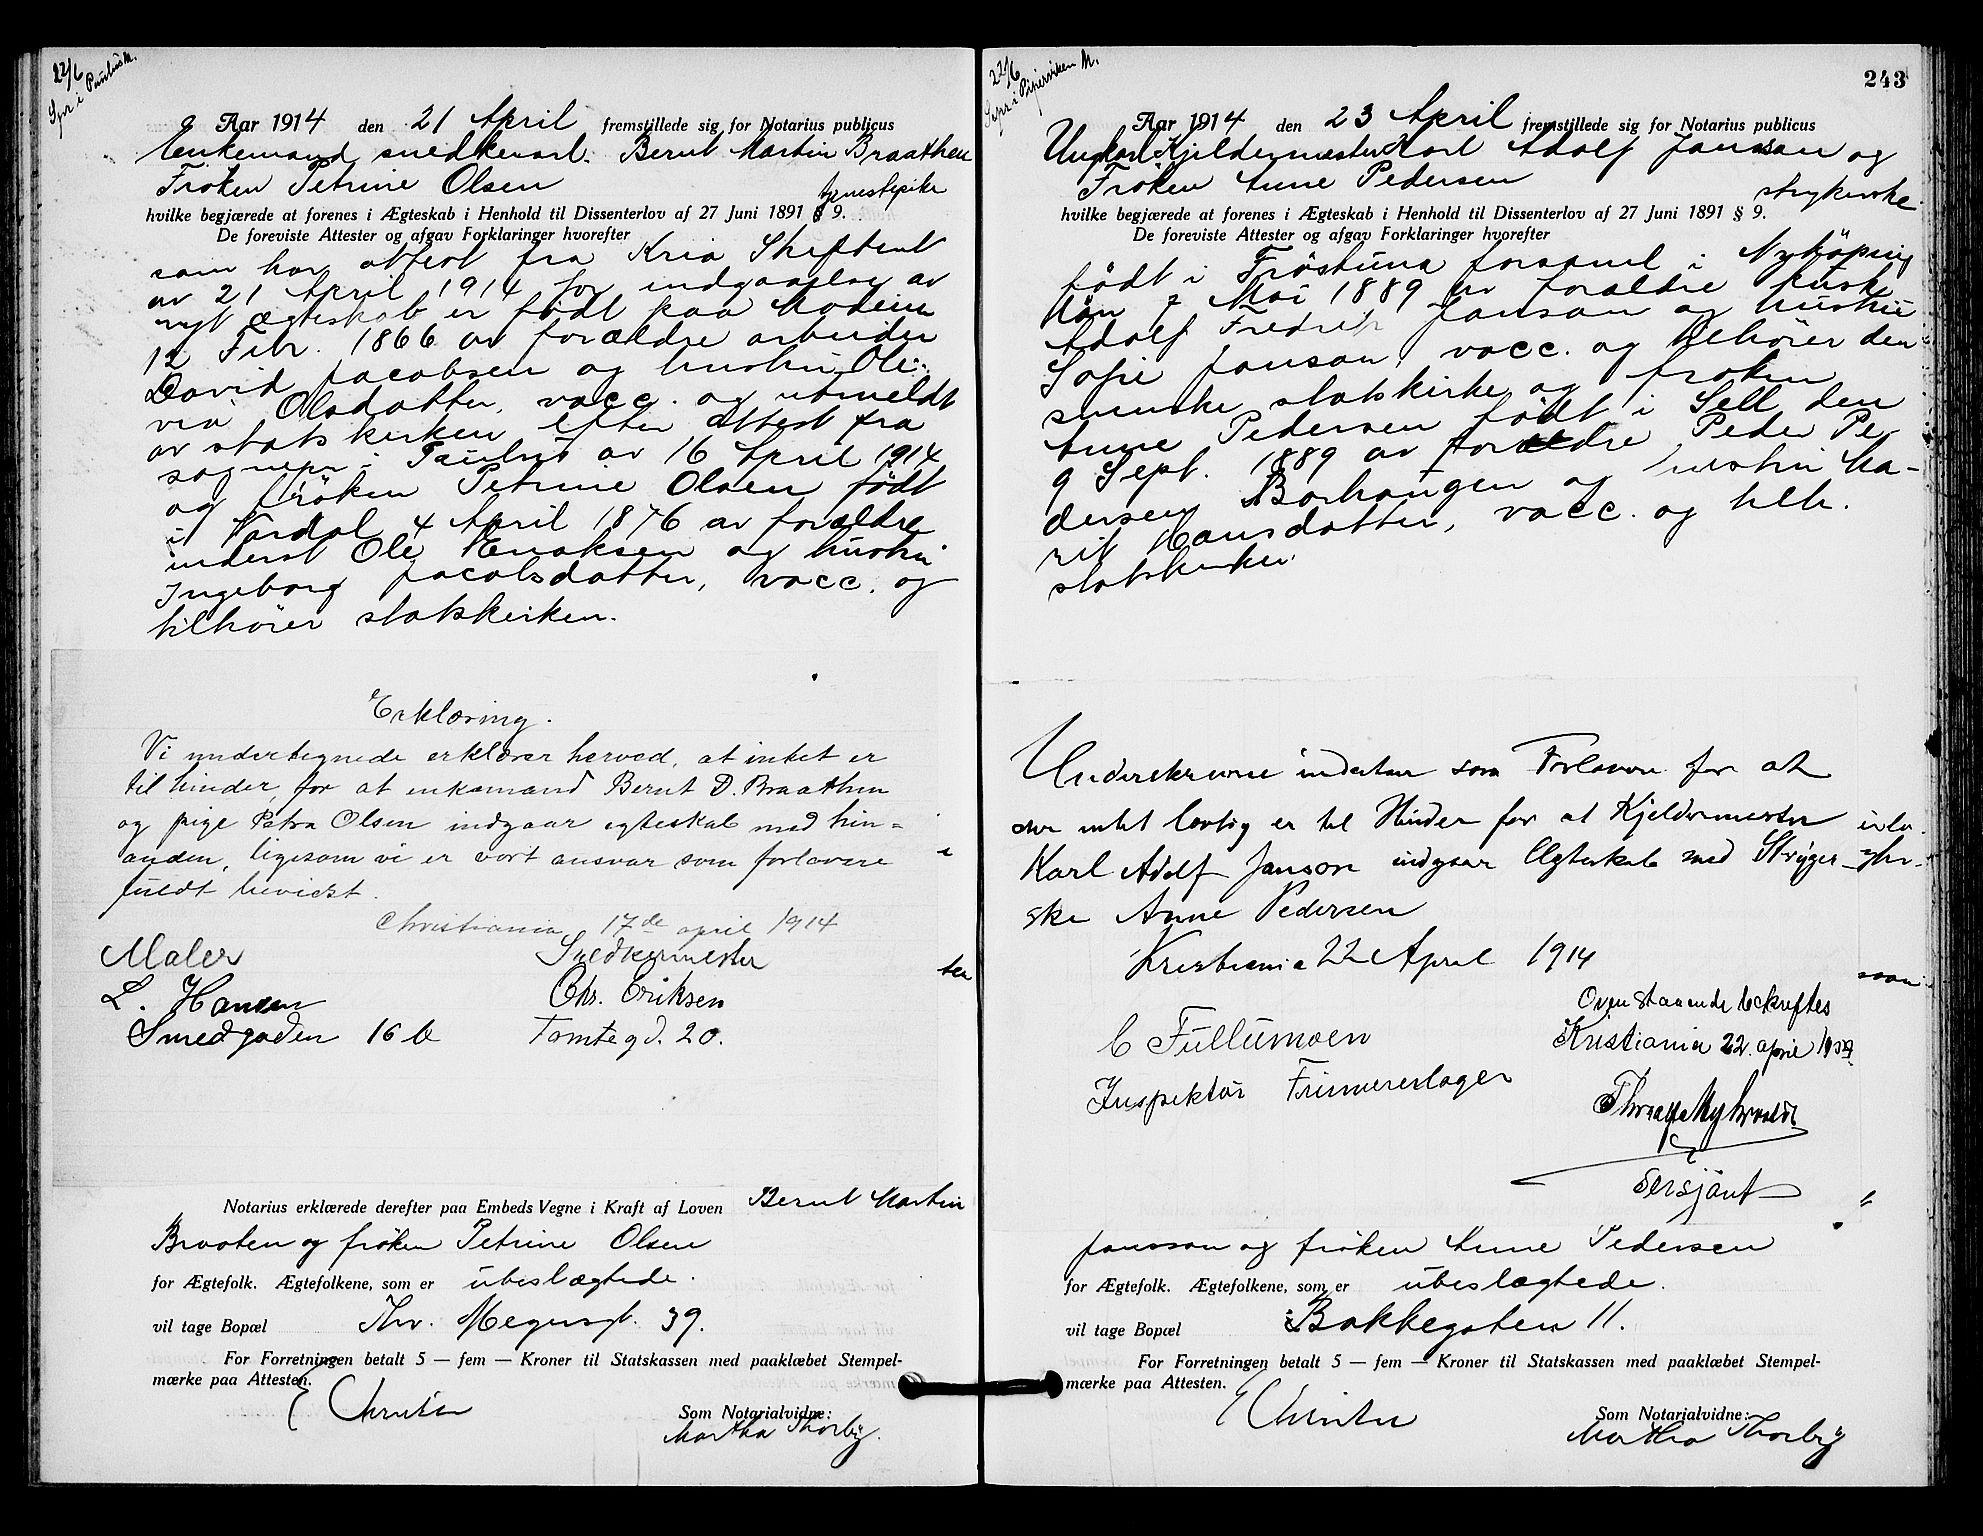 SAO, Oslo byfogd avd. I, L/Lb/Lbb/L0009: Notarialprotokoll, rekke II: Vigsler, 1913-1914, s. 242b-243a